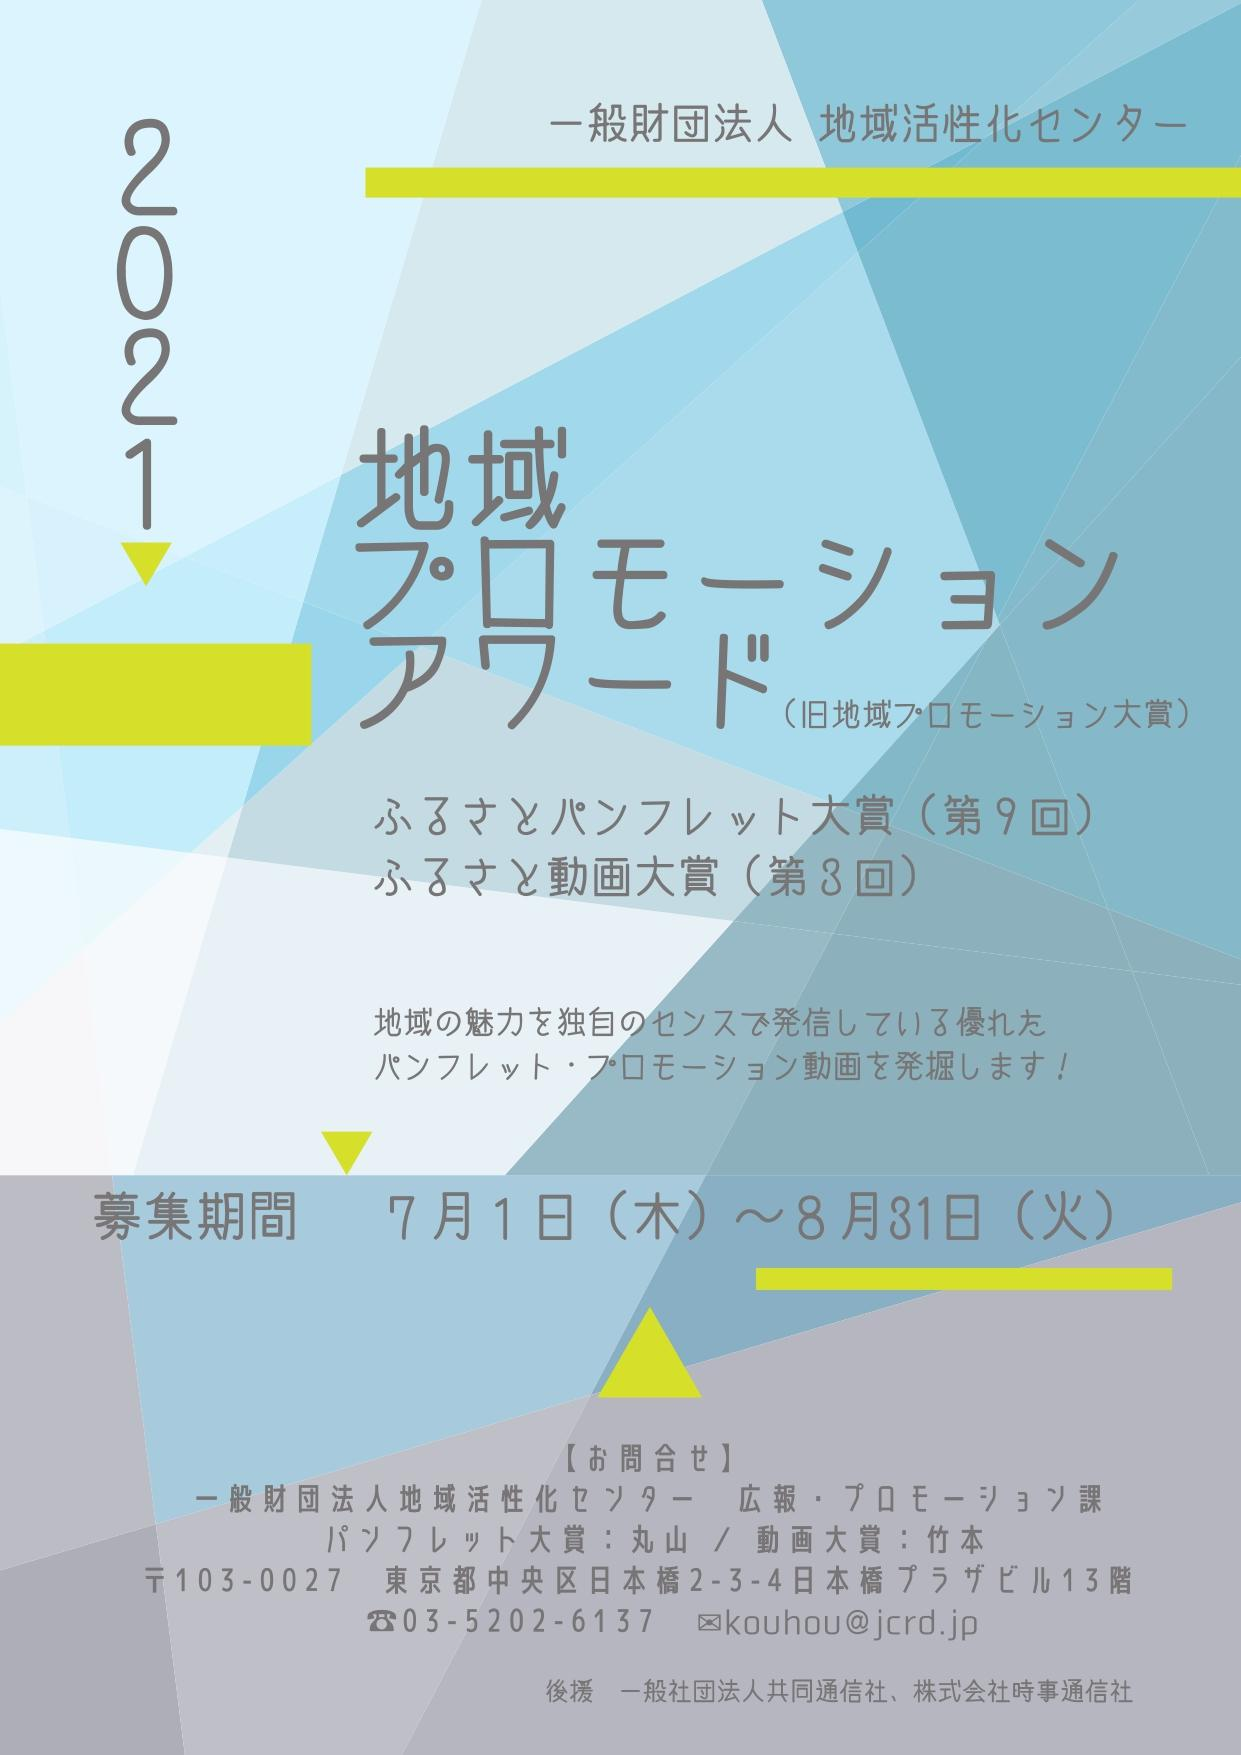 https://www.jcrd.jp/publications/3ab672986b59bcbb9e8a1c92e2621fd28ea7e999.jpg